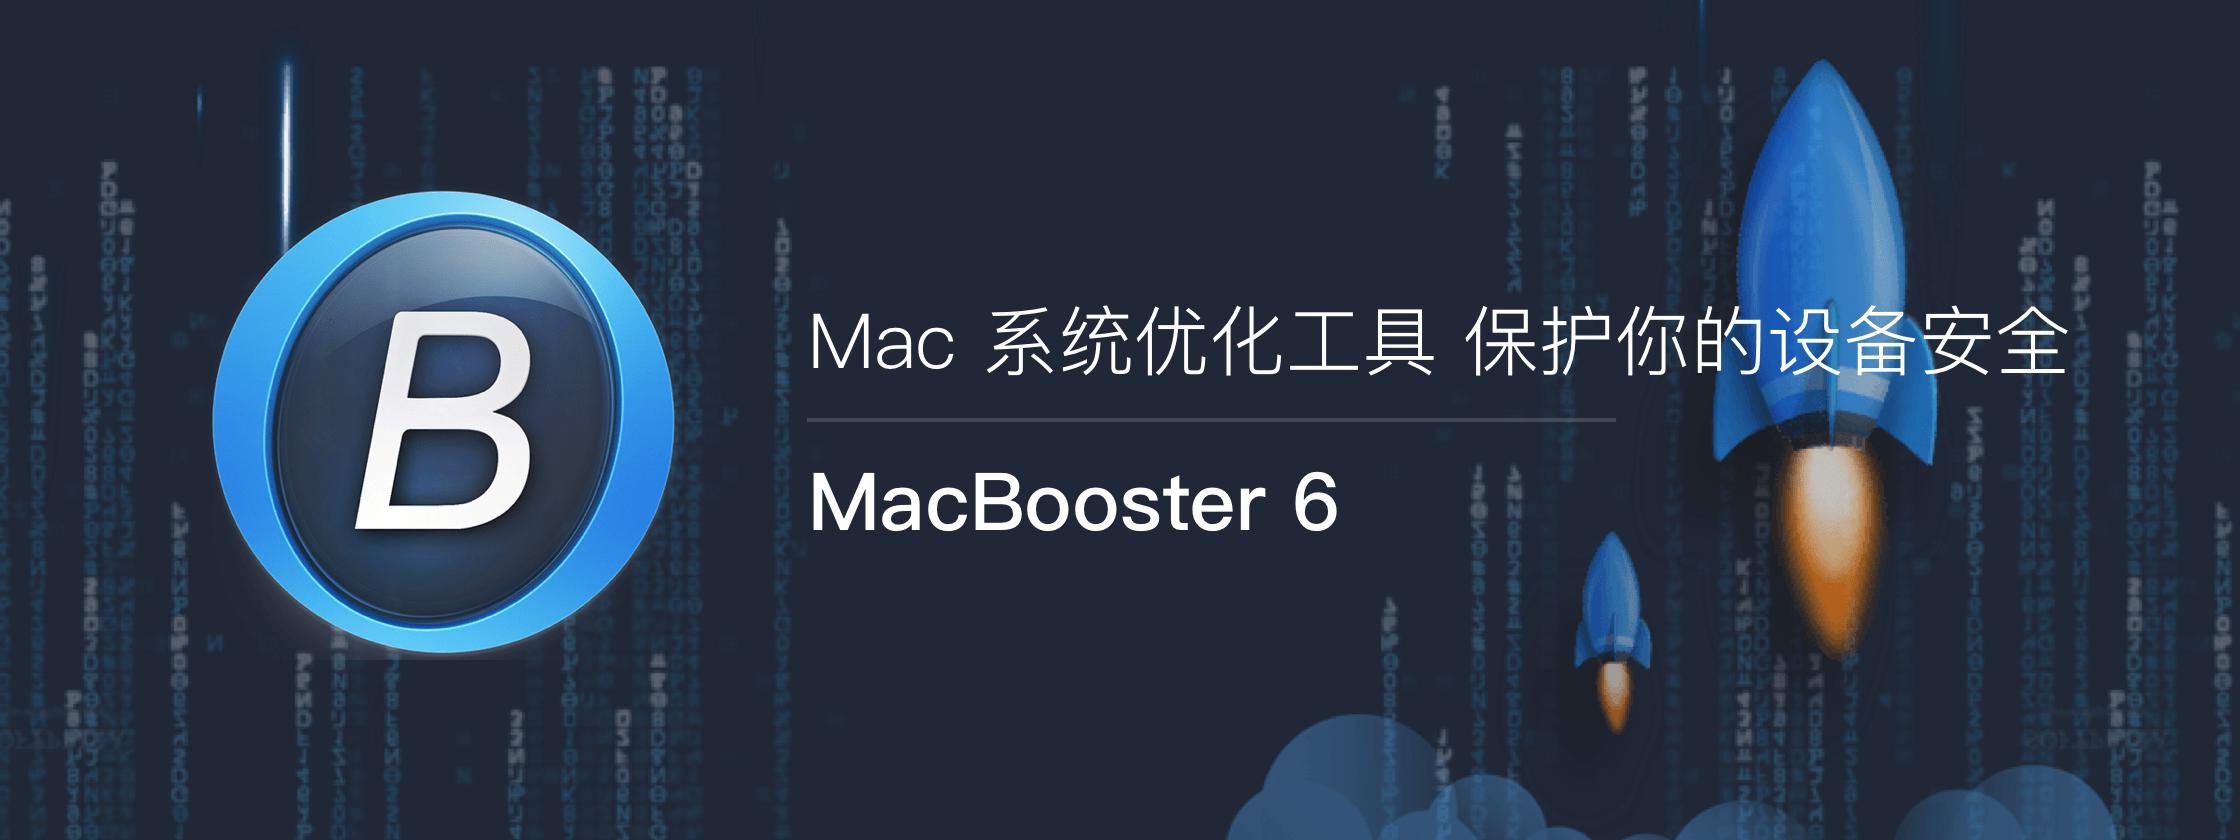 MacBooster 6,Mac 系统优化工具,保护你的设备安全